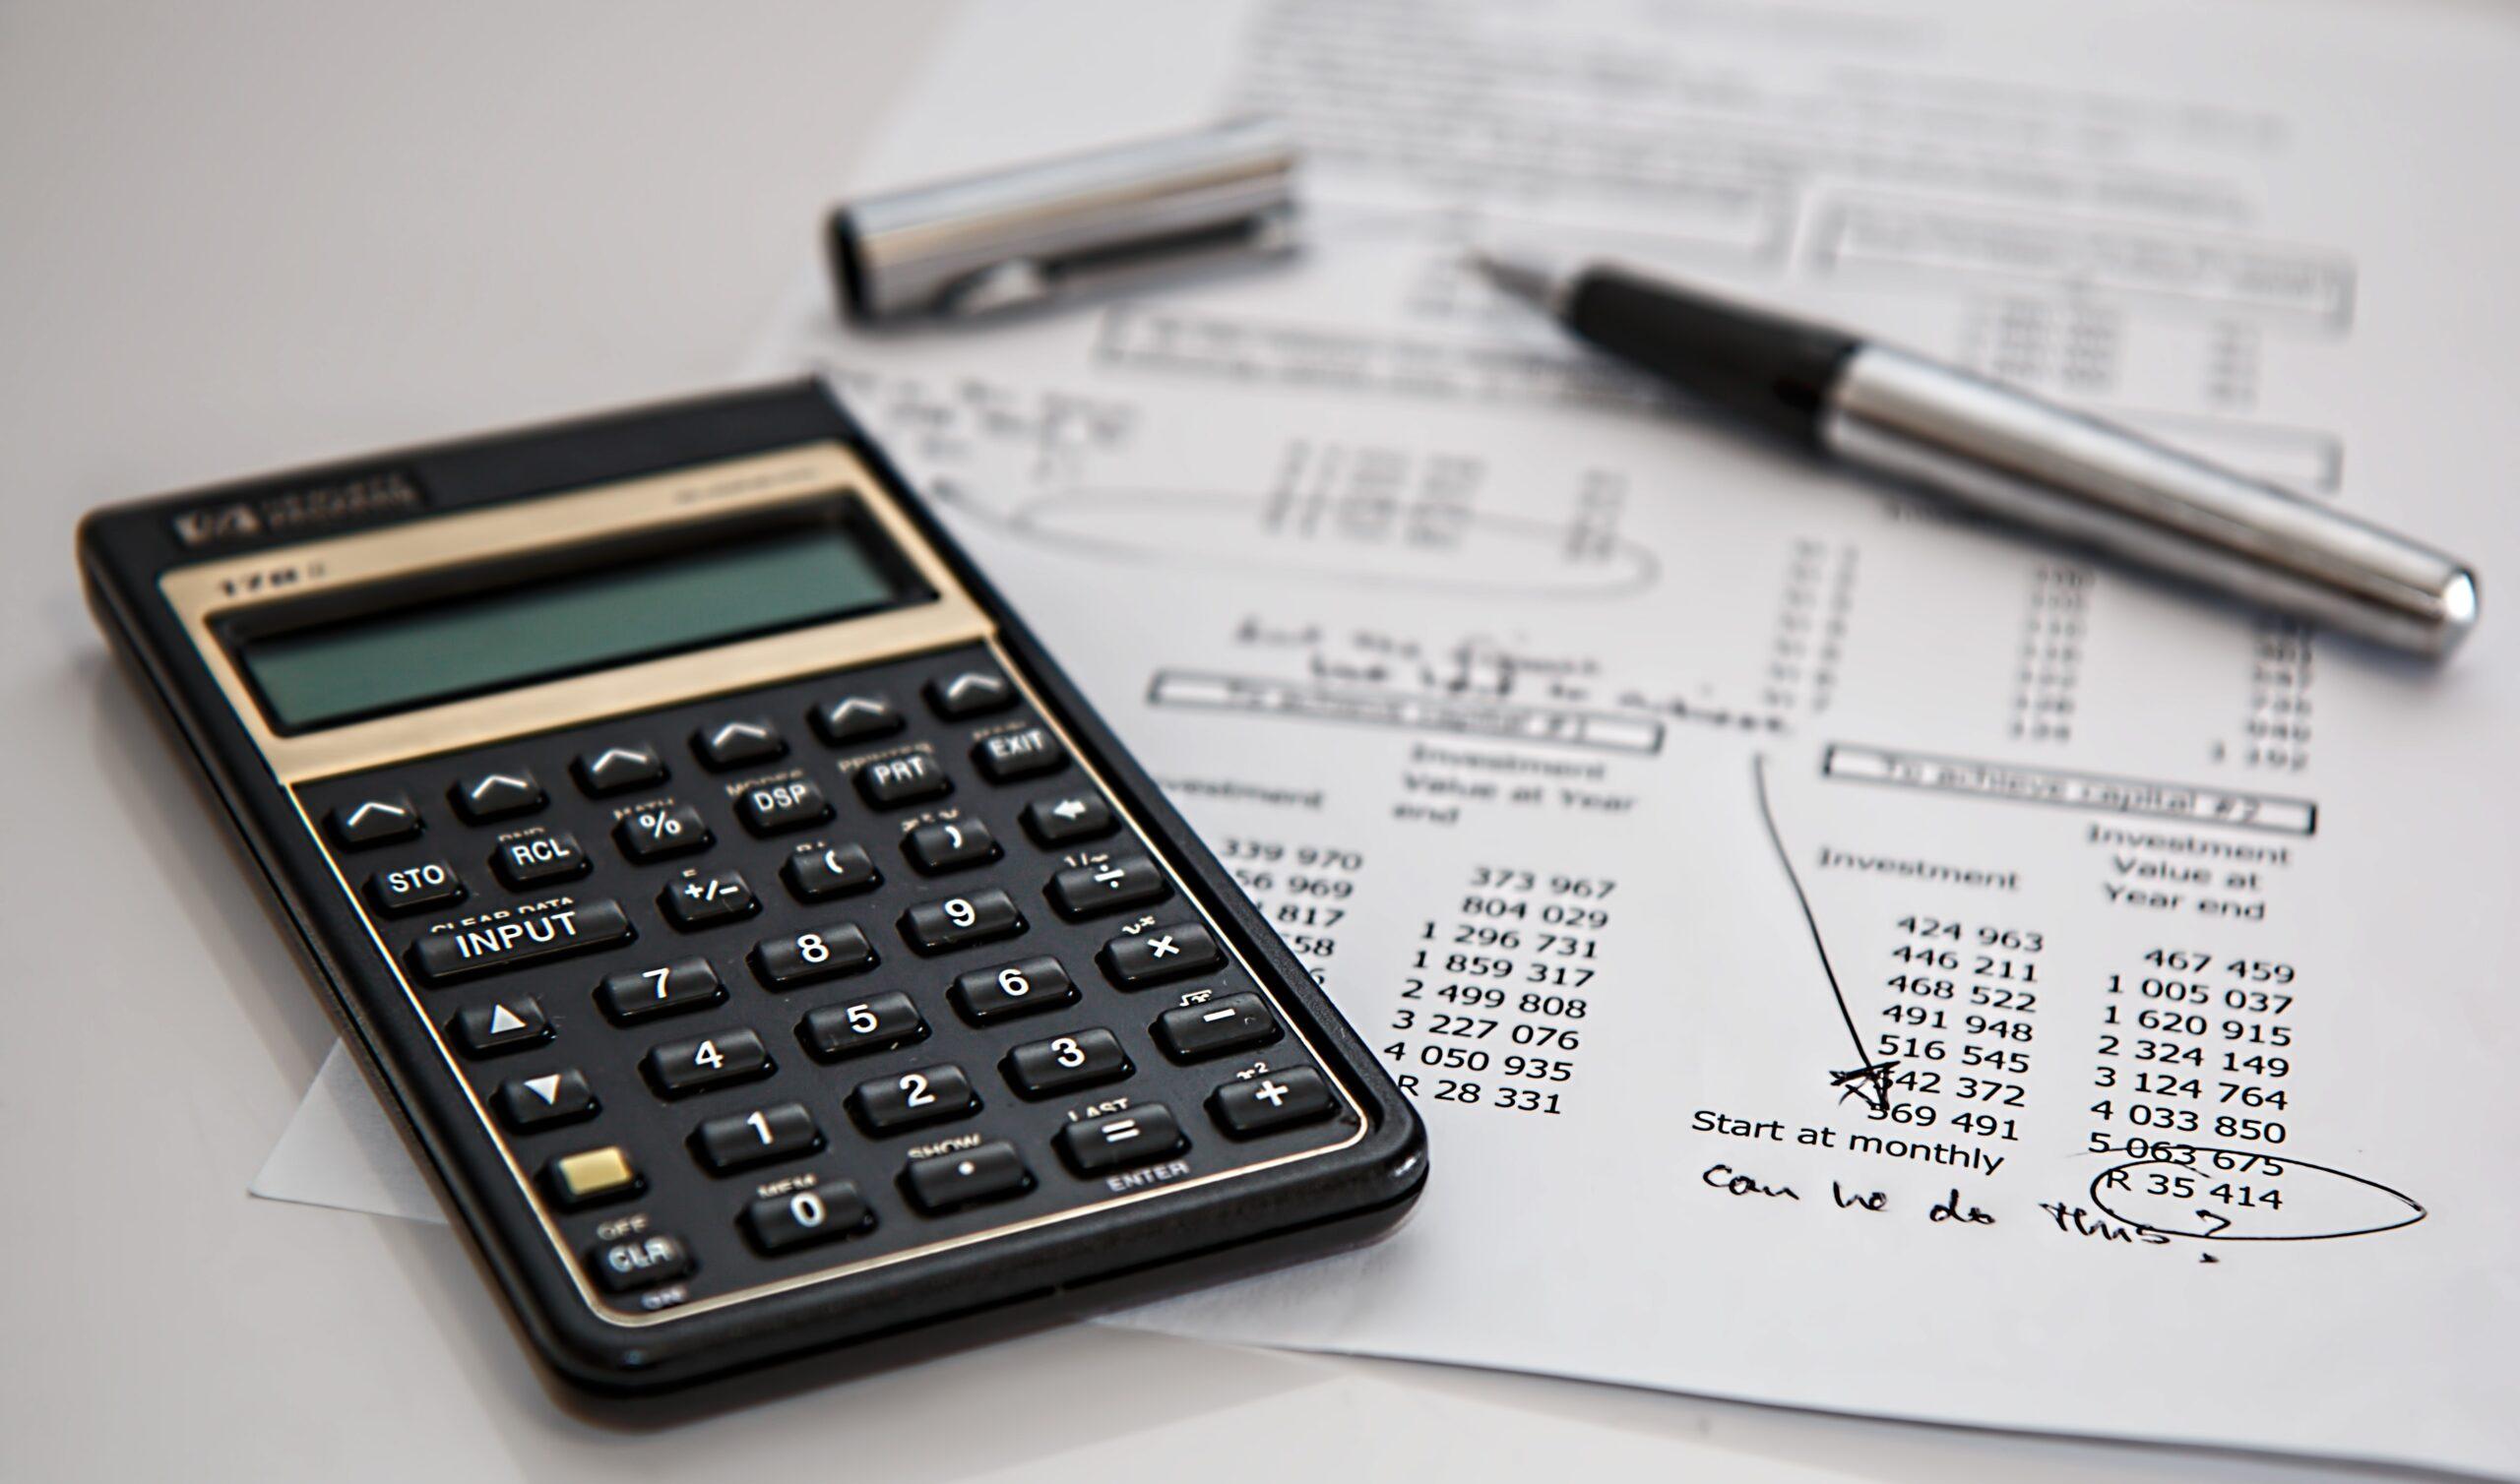 Using our Hard Money Loan Calculator